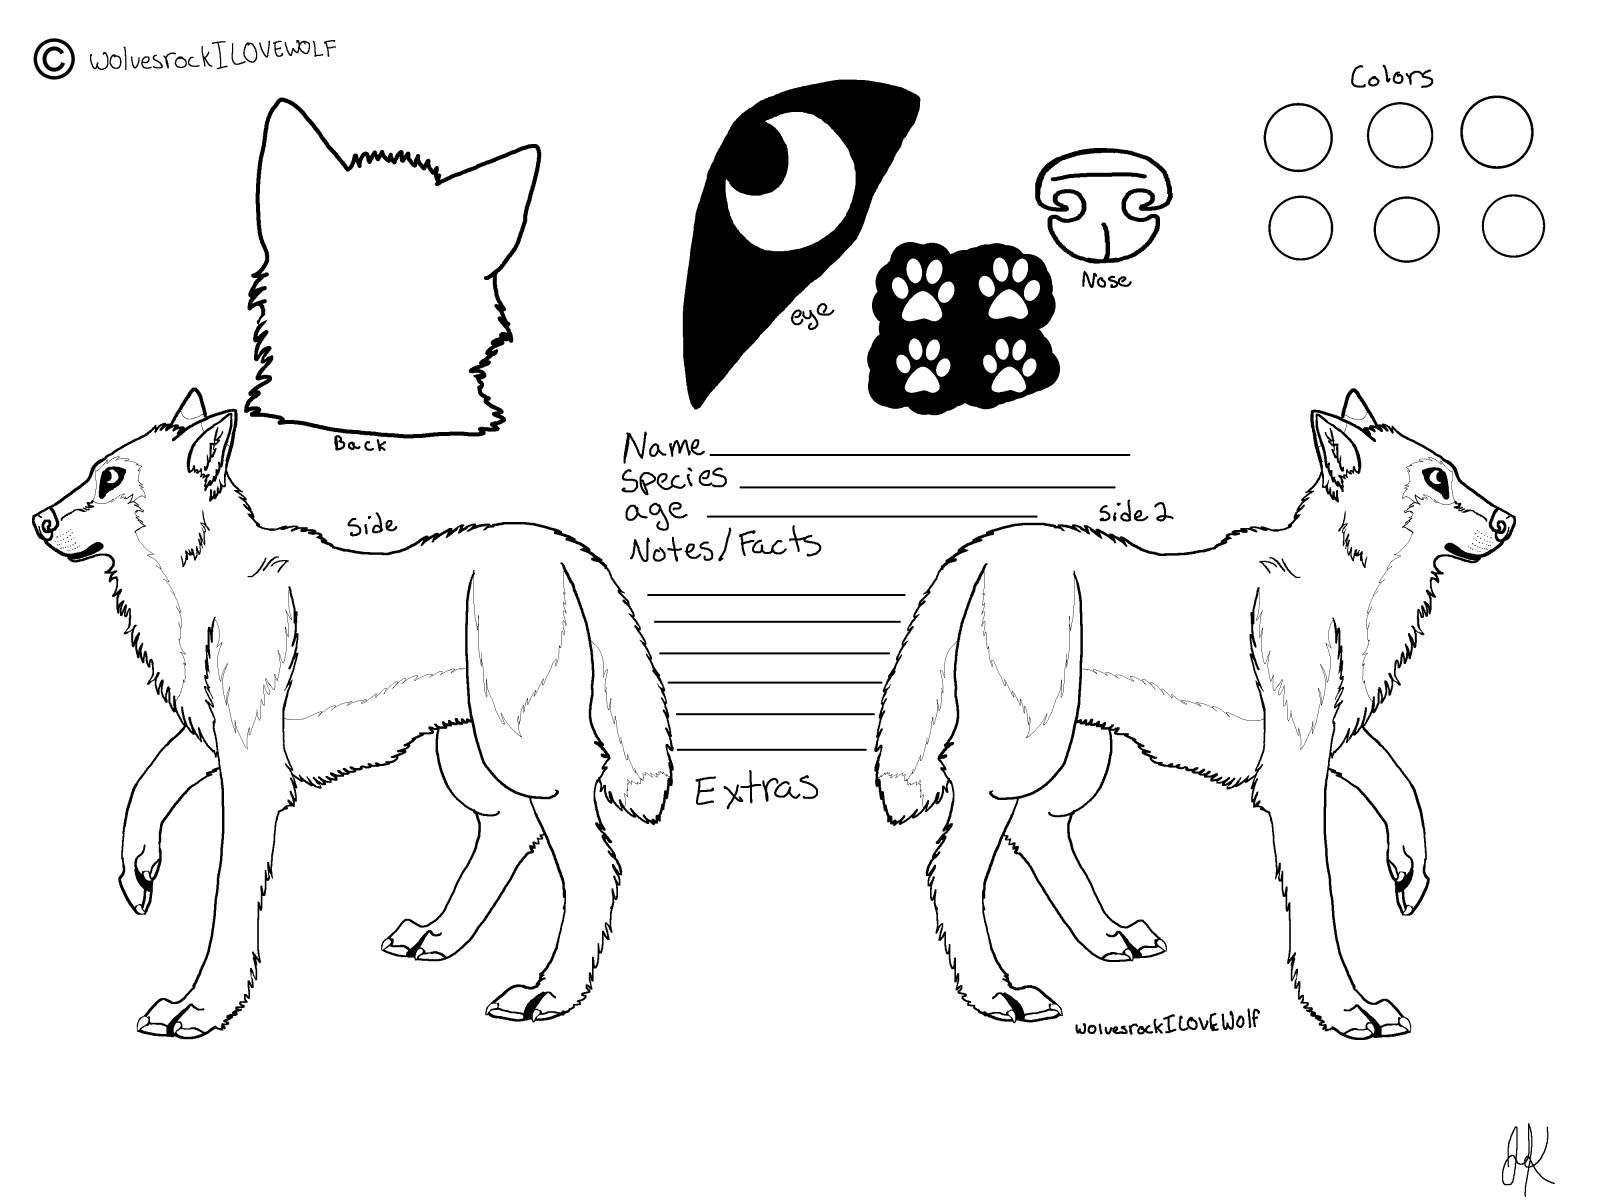 free_wolf_reference_sheet_line_art_by_wolvesrockilovewolf-d4msscw.jpg